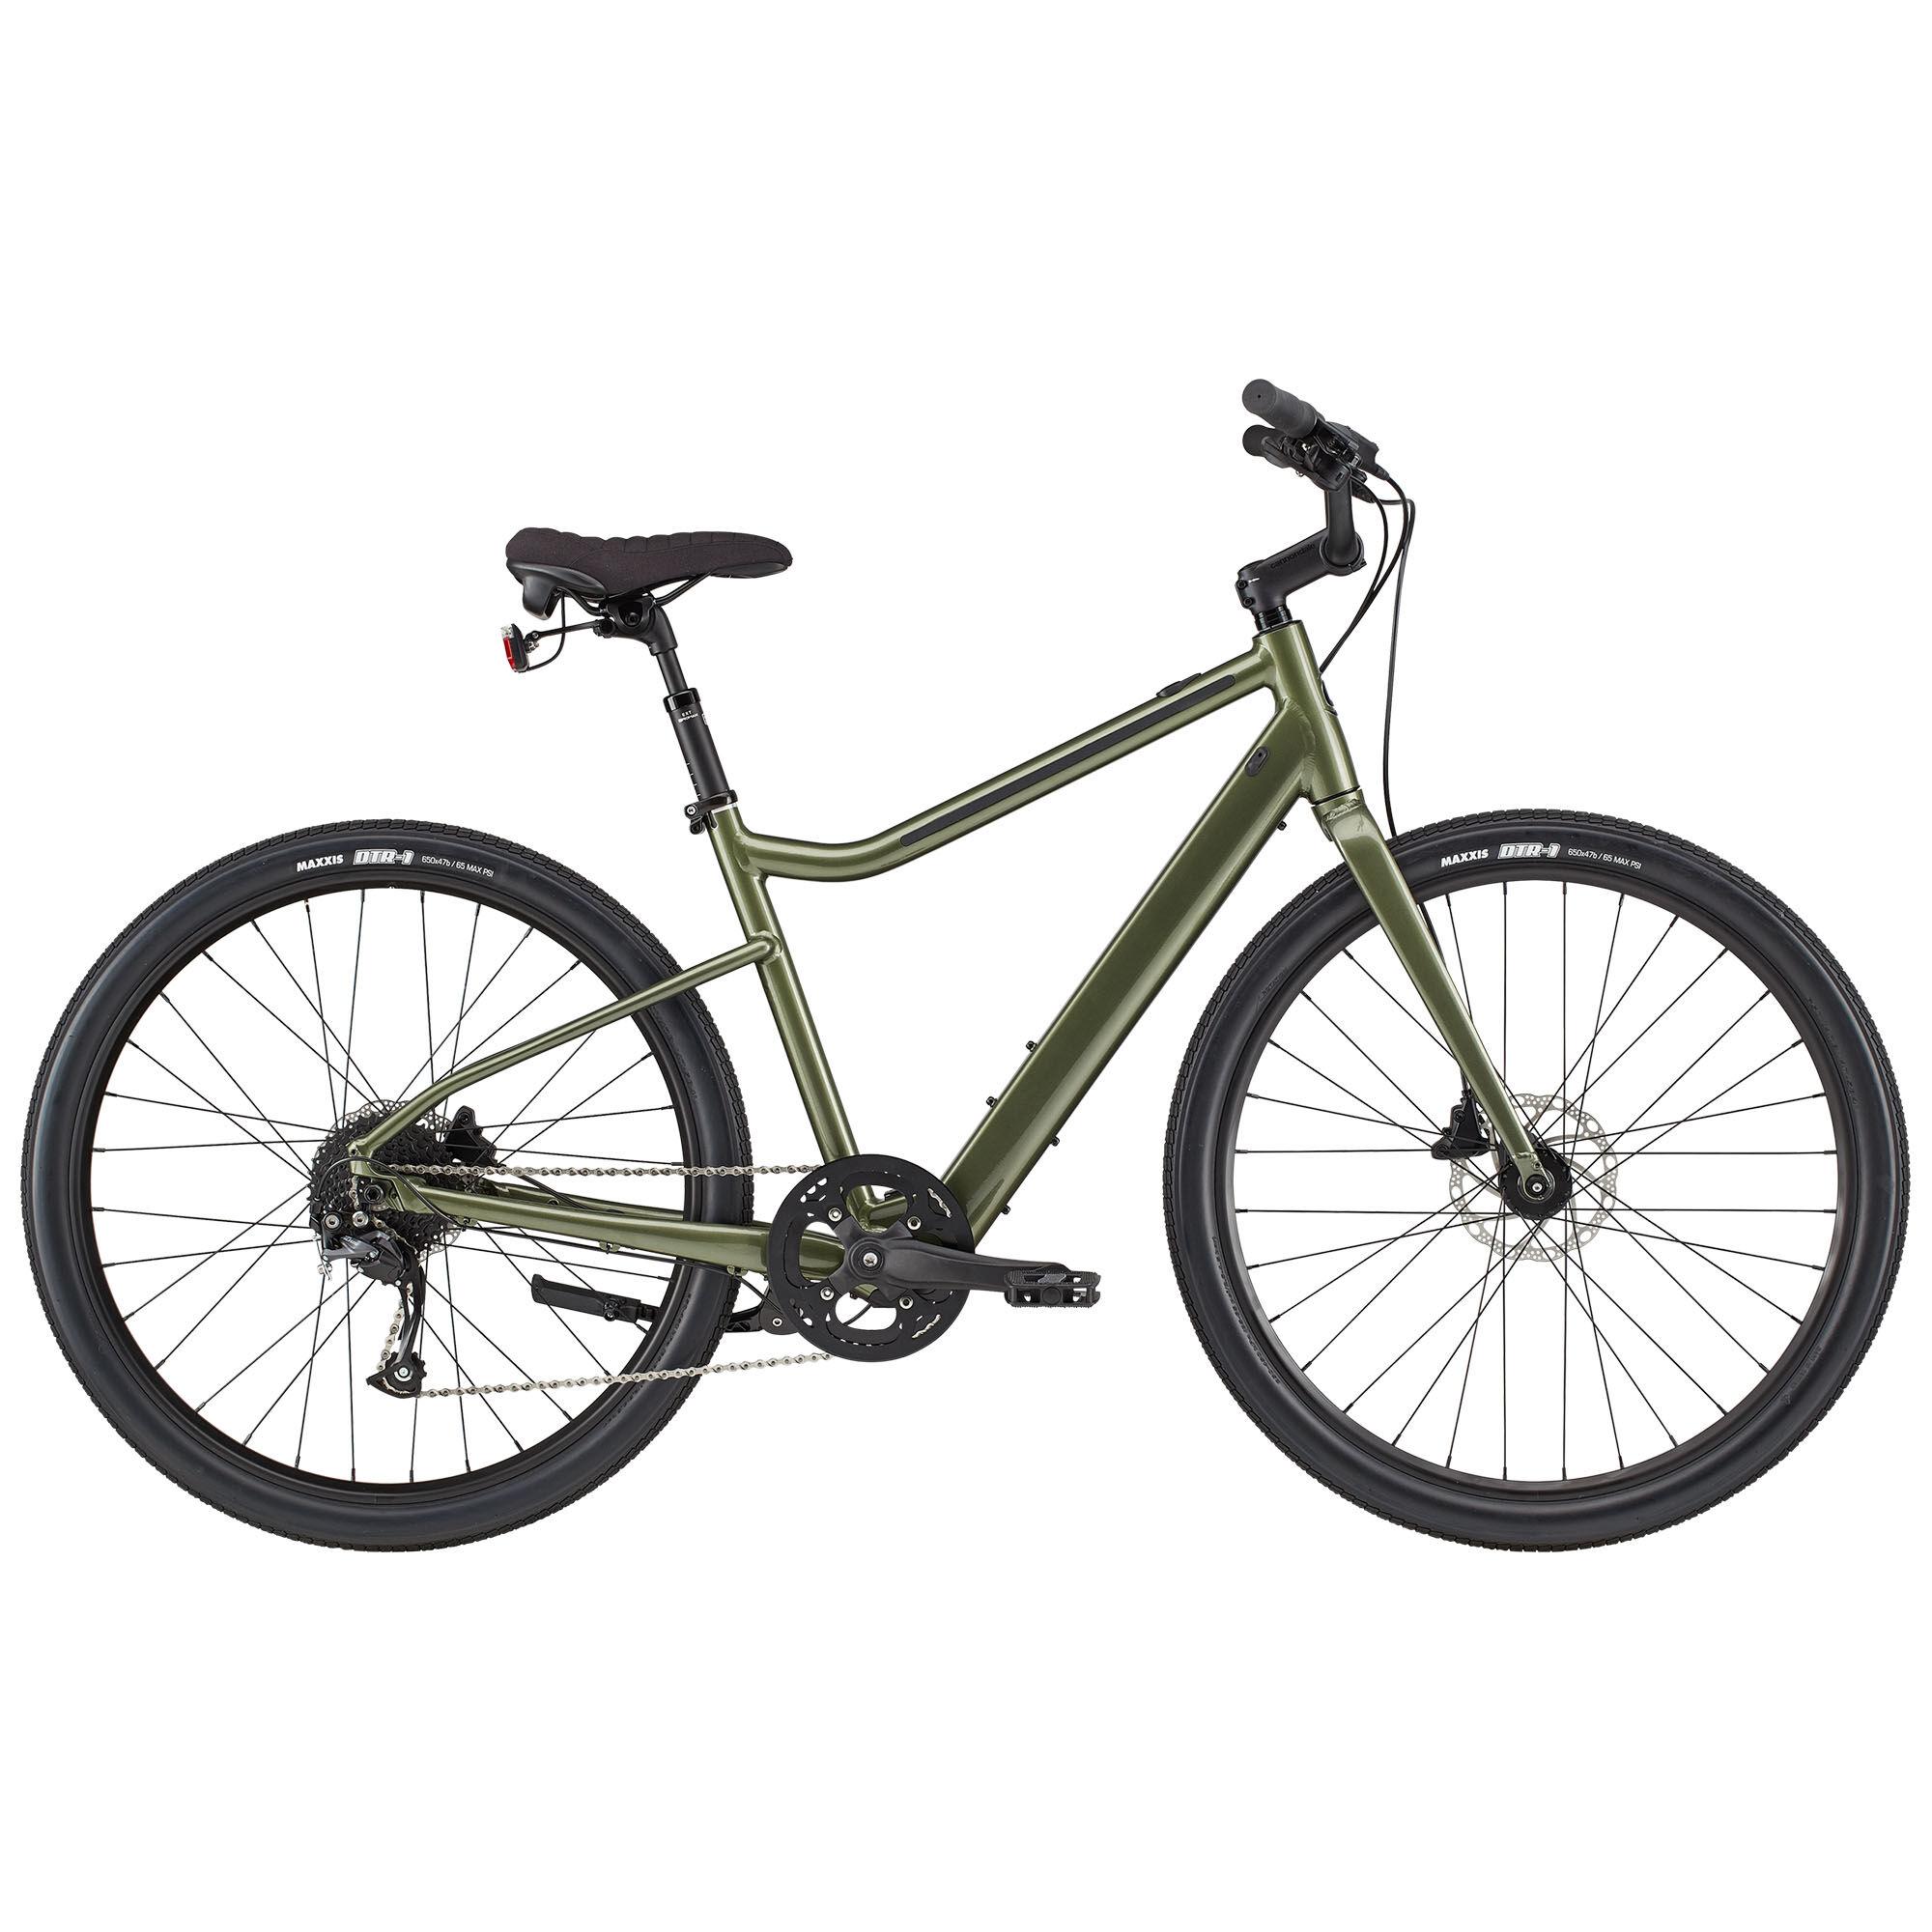 Cannondale Men's Treadwell Neo Electric Bike '20  - Mantis - Size: Medium